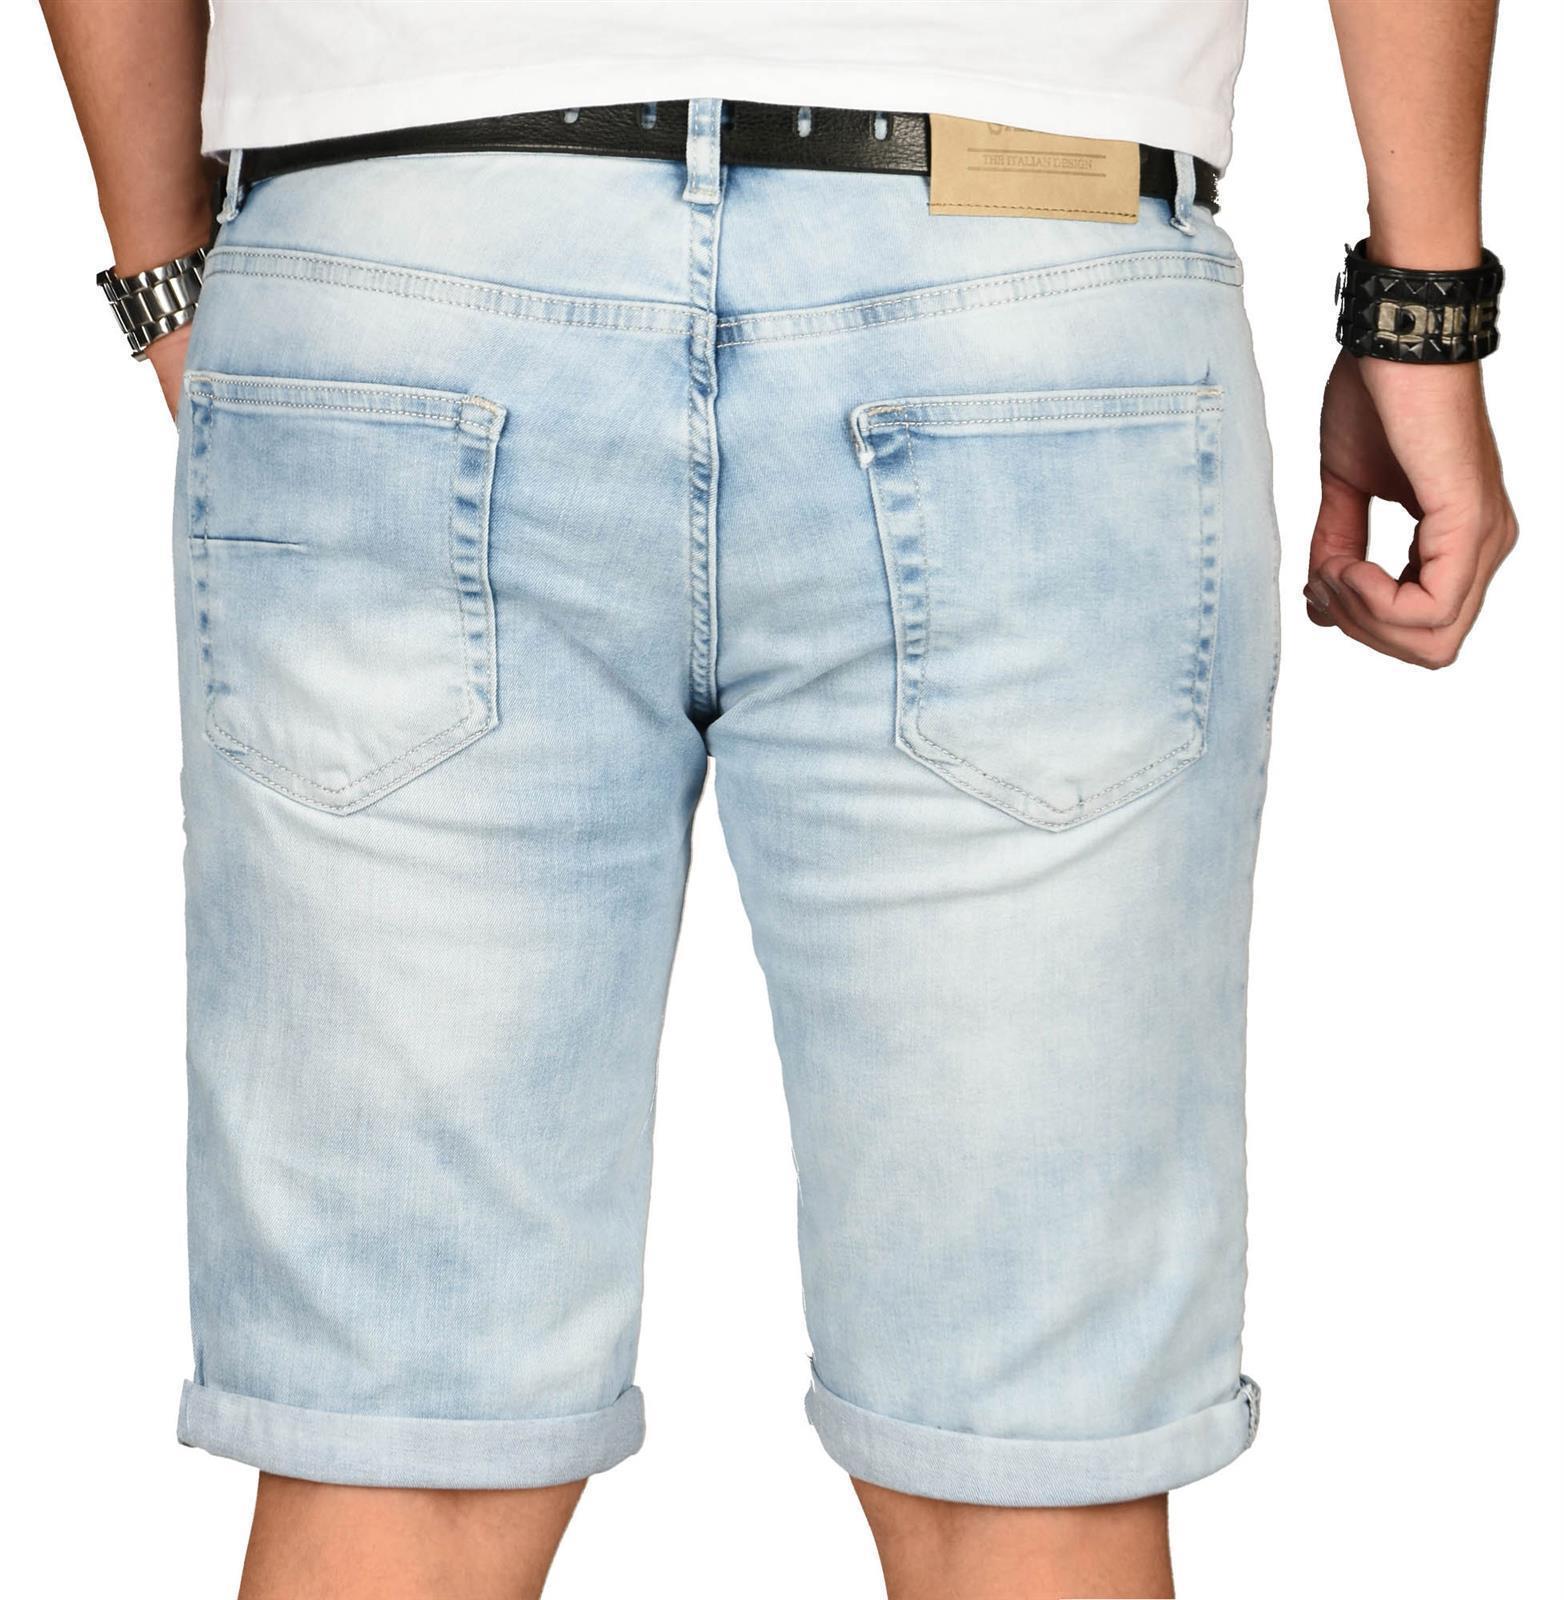 A-Salvarini-Herren-Designer-Jeans-Short-kurze-Hose-Slim-Sommer-Shorts-Washed Indexbild 13